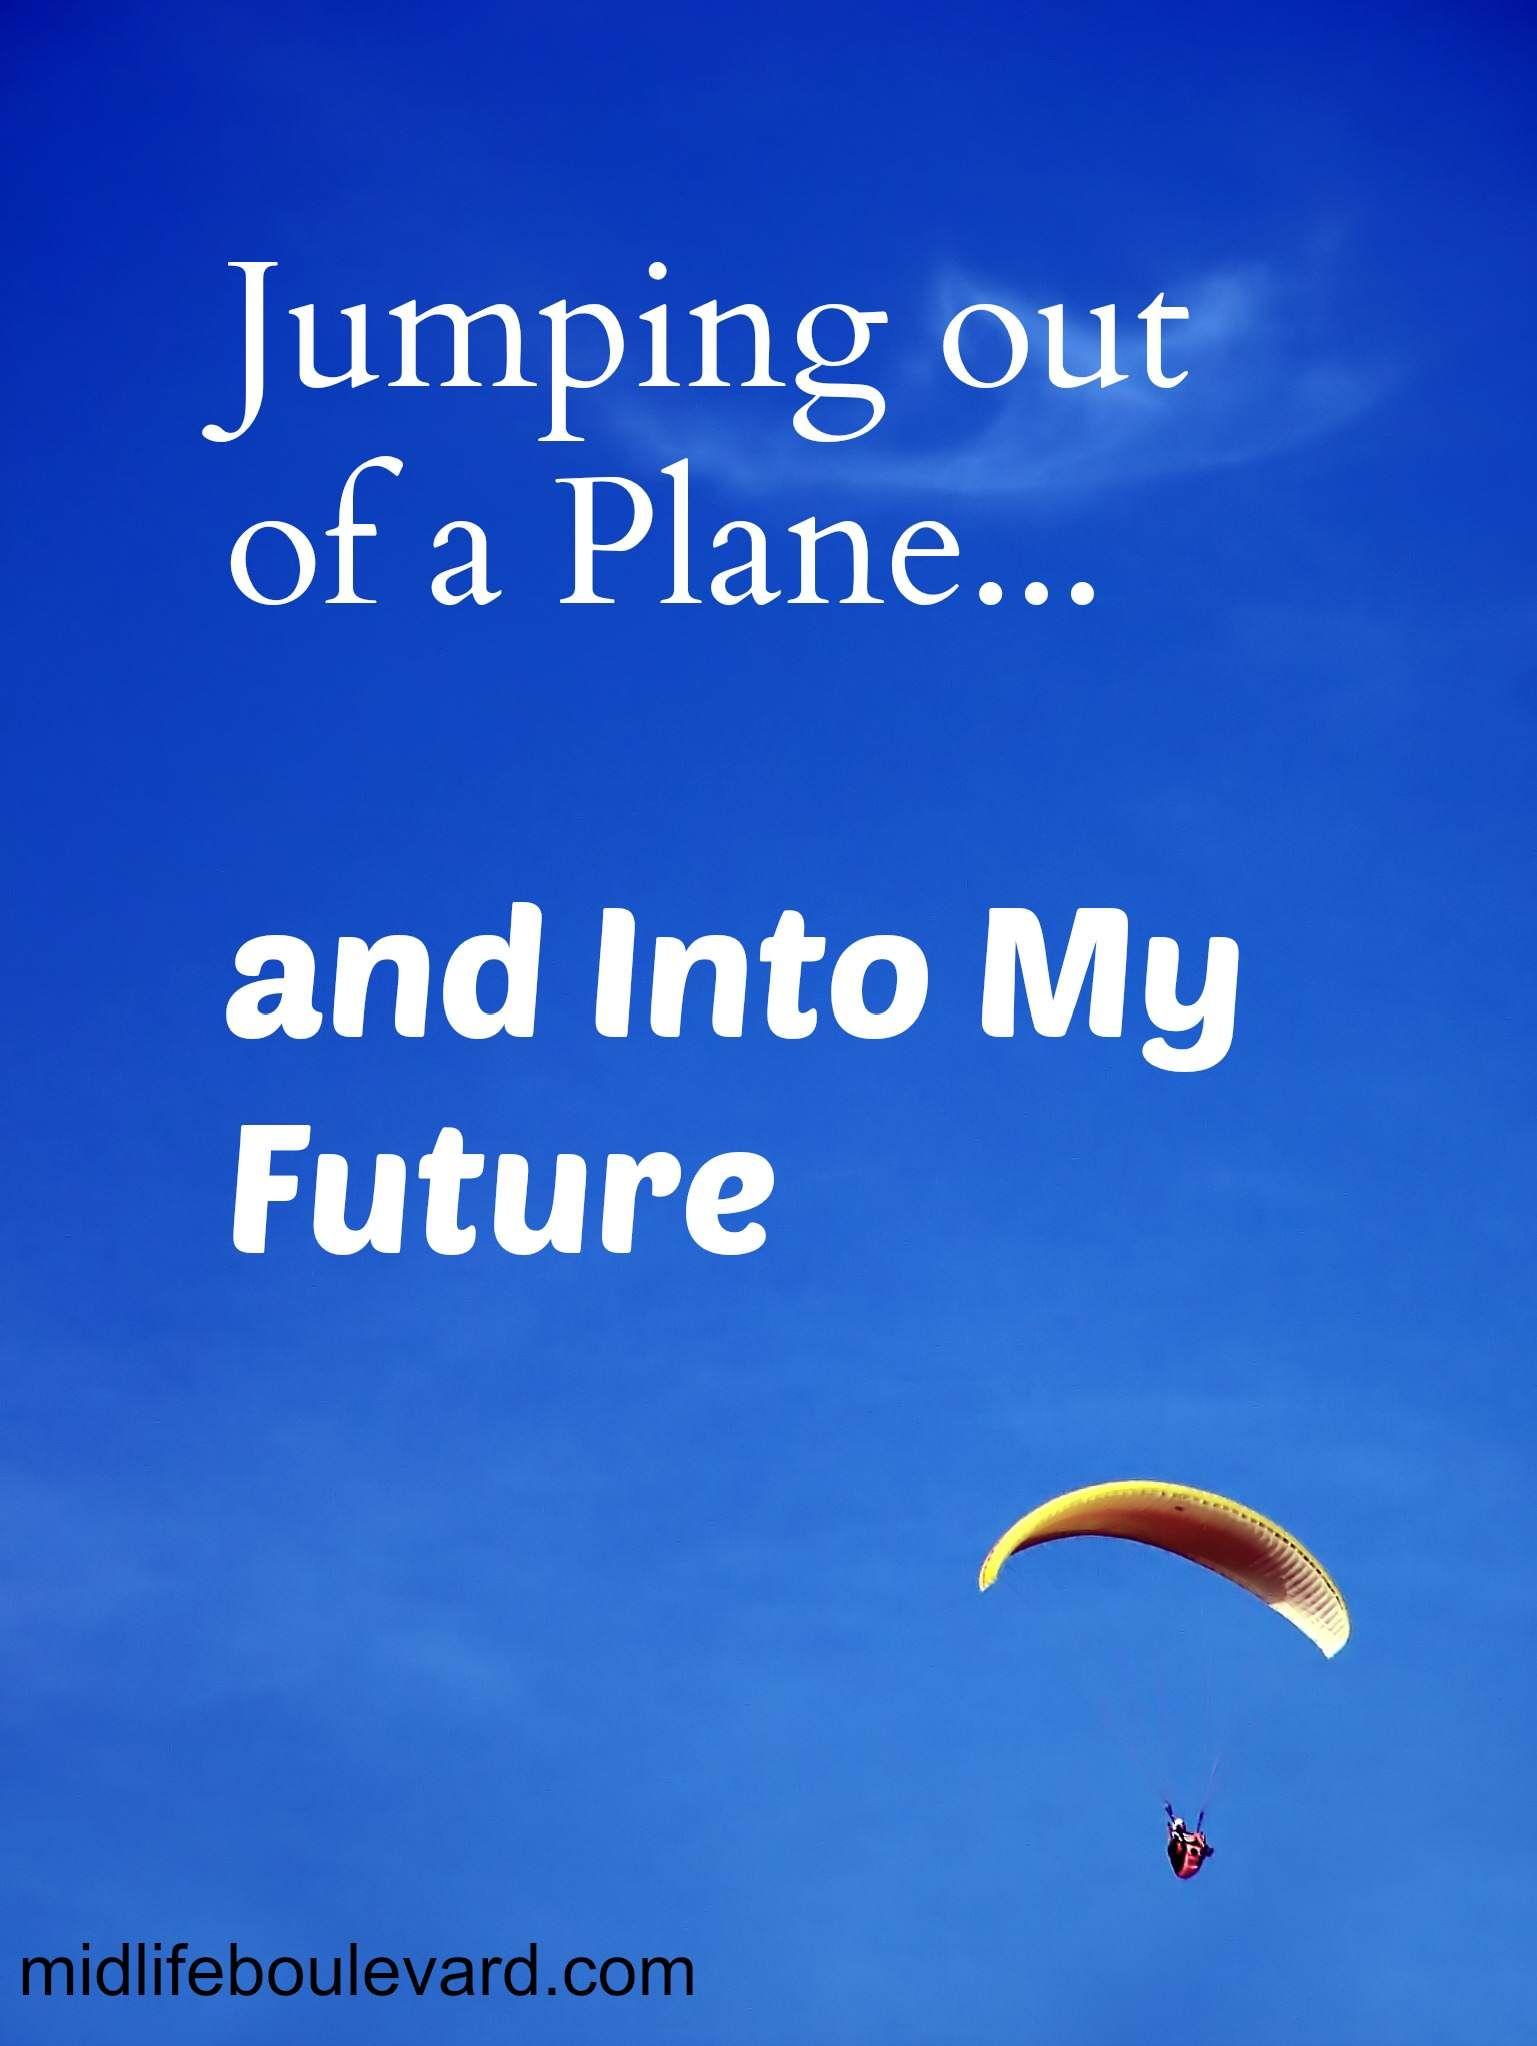 https://www.facebook.com/pages/Sky-Diving/431910883651158?ref=bookmarks